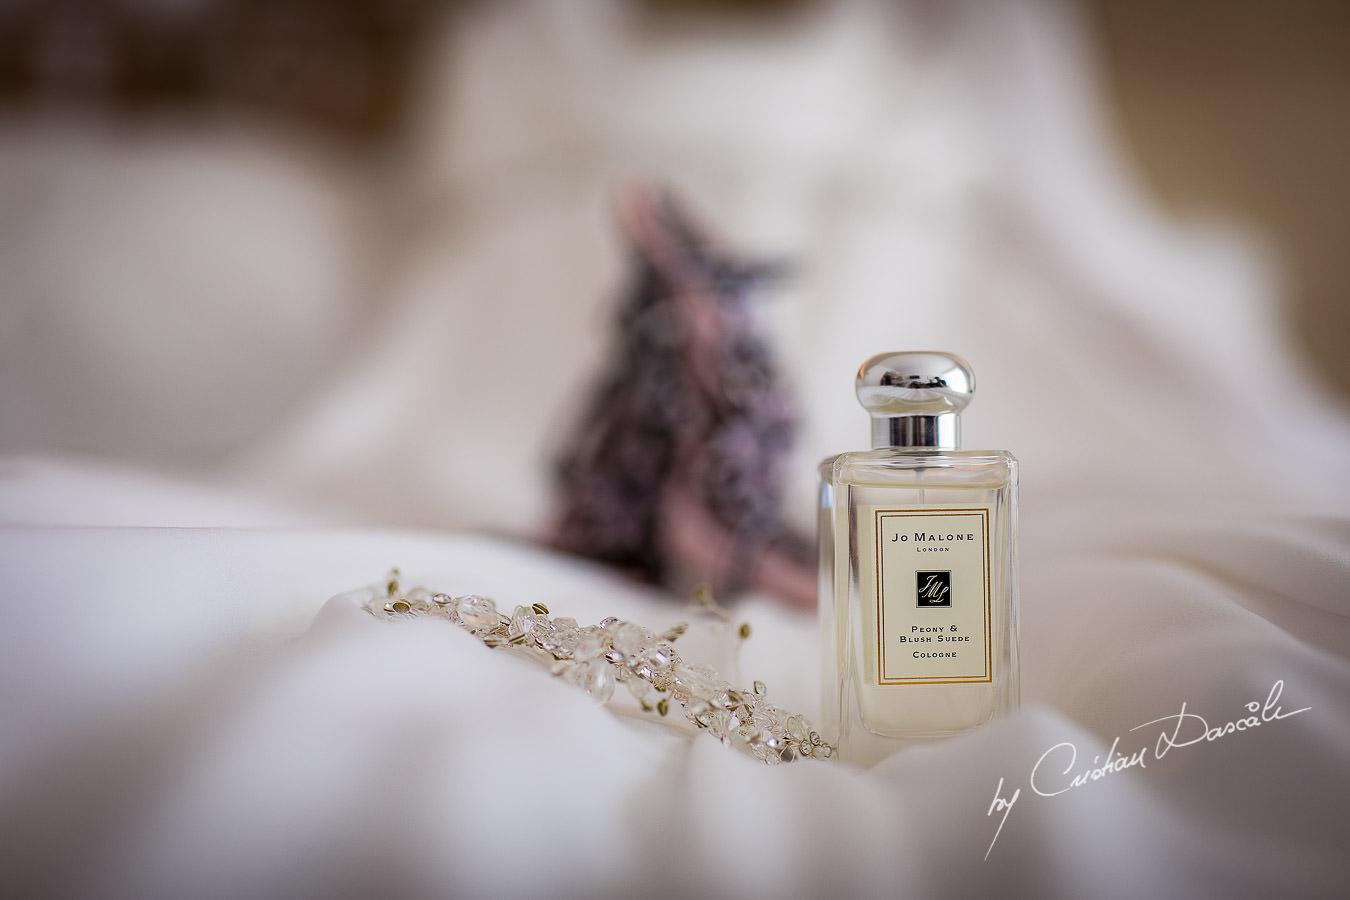 Bridal perfume by Jo Malone captured by Cristian Dascalu during an elegant Aphrodite Hills Wedding in Cyprus.